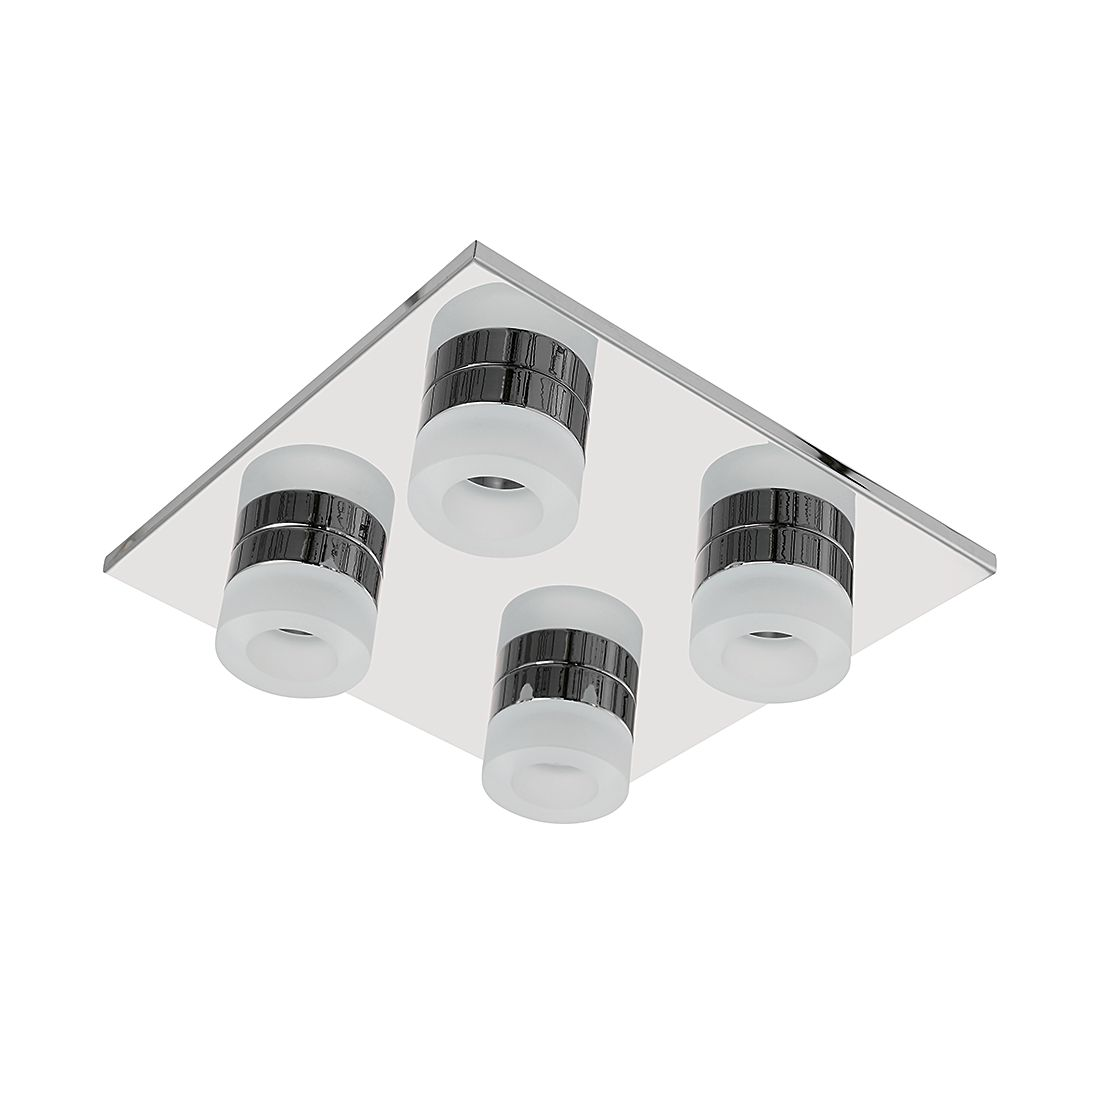 EEK A+, Deckenleuchte LOGAN – Metall/Kunststoff – 4-flammig, Wofi günstig